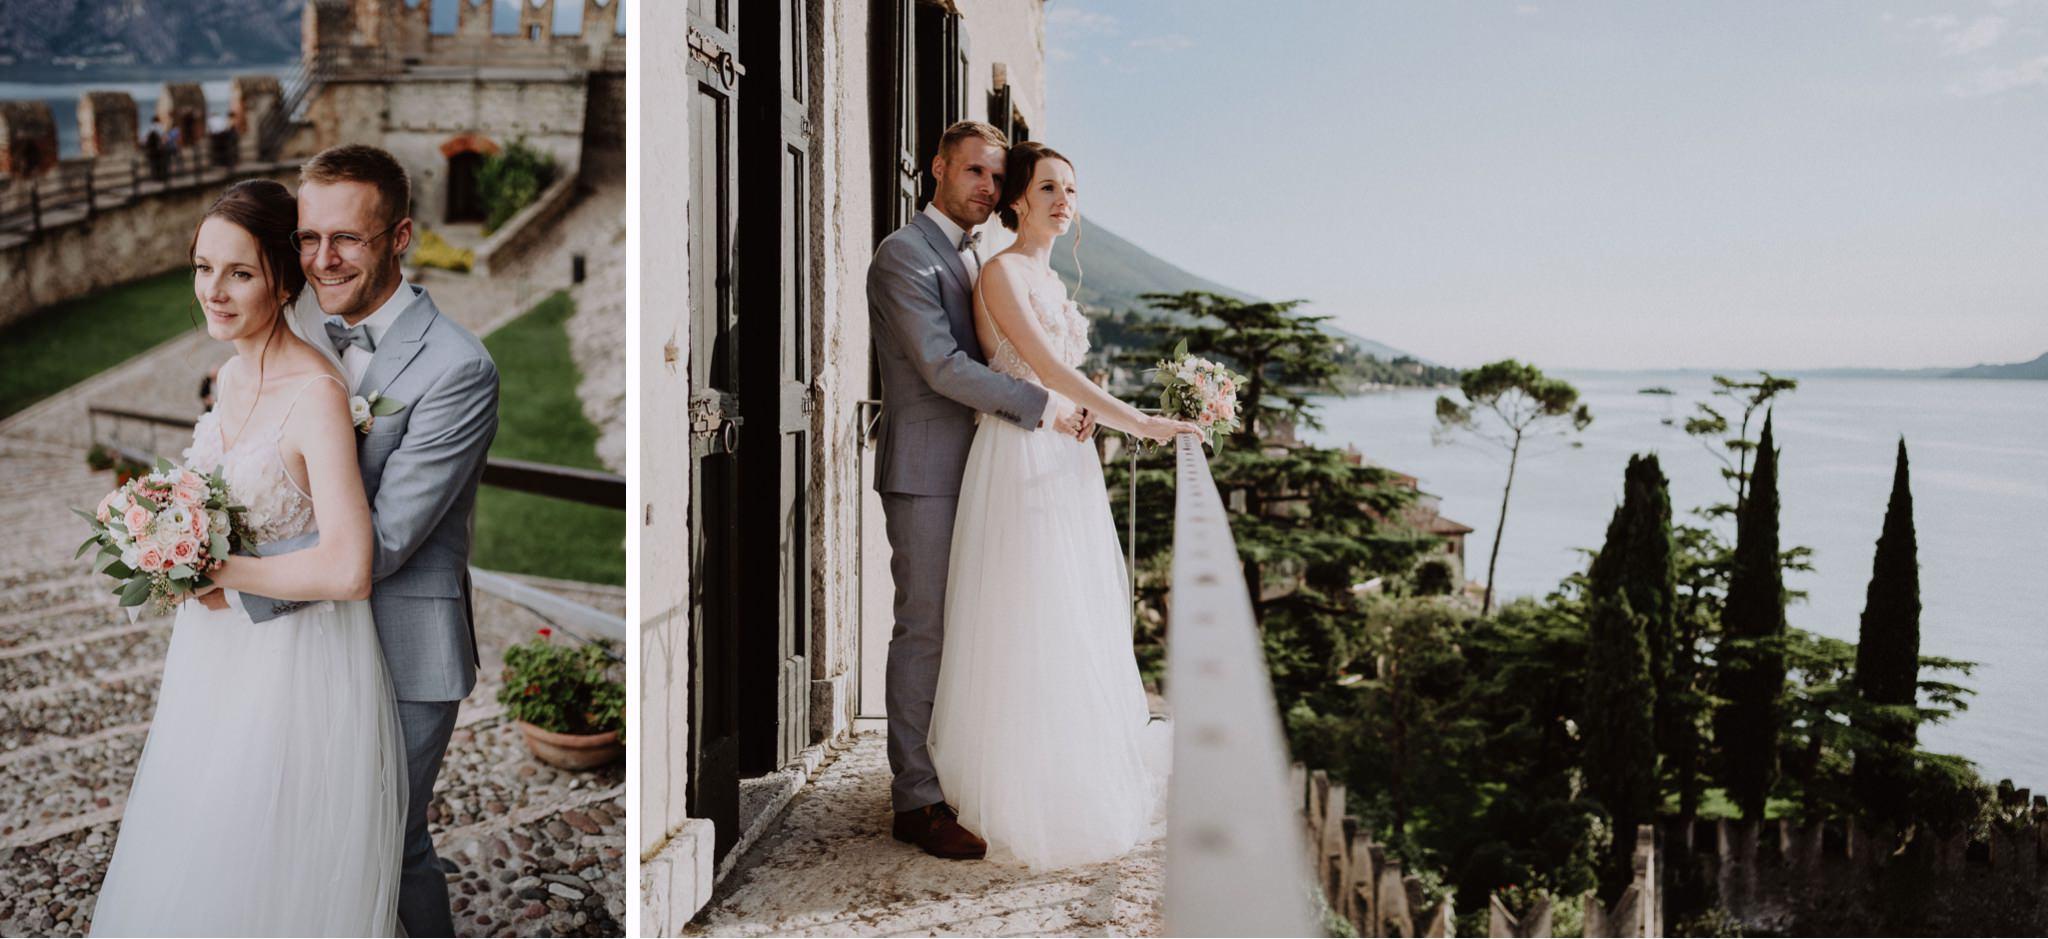 45 la 03 zeremonie 1221 la 03 zeremonie 1237 weddinphotographer Hochzeitsfotograf hamilton Stuttgart Weddingphotography newzealand